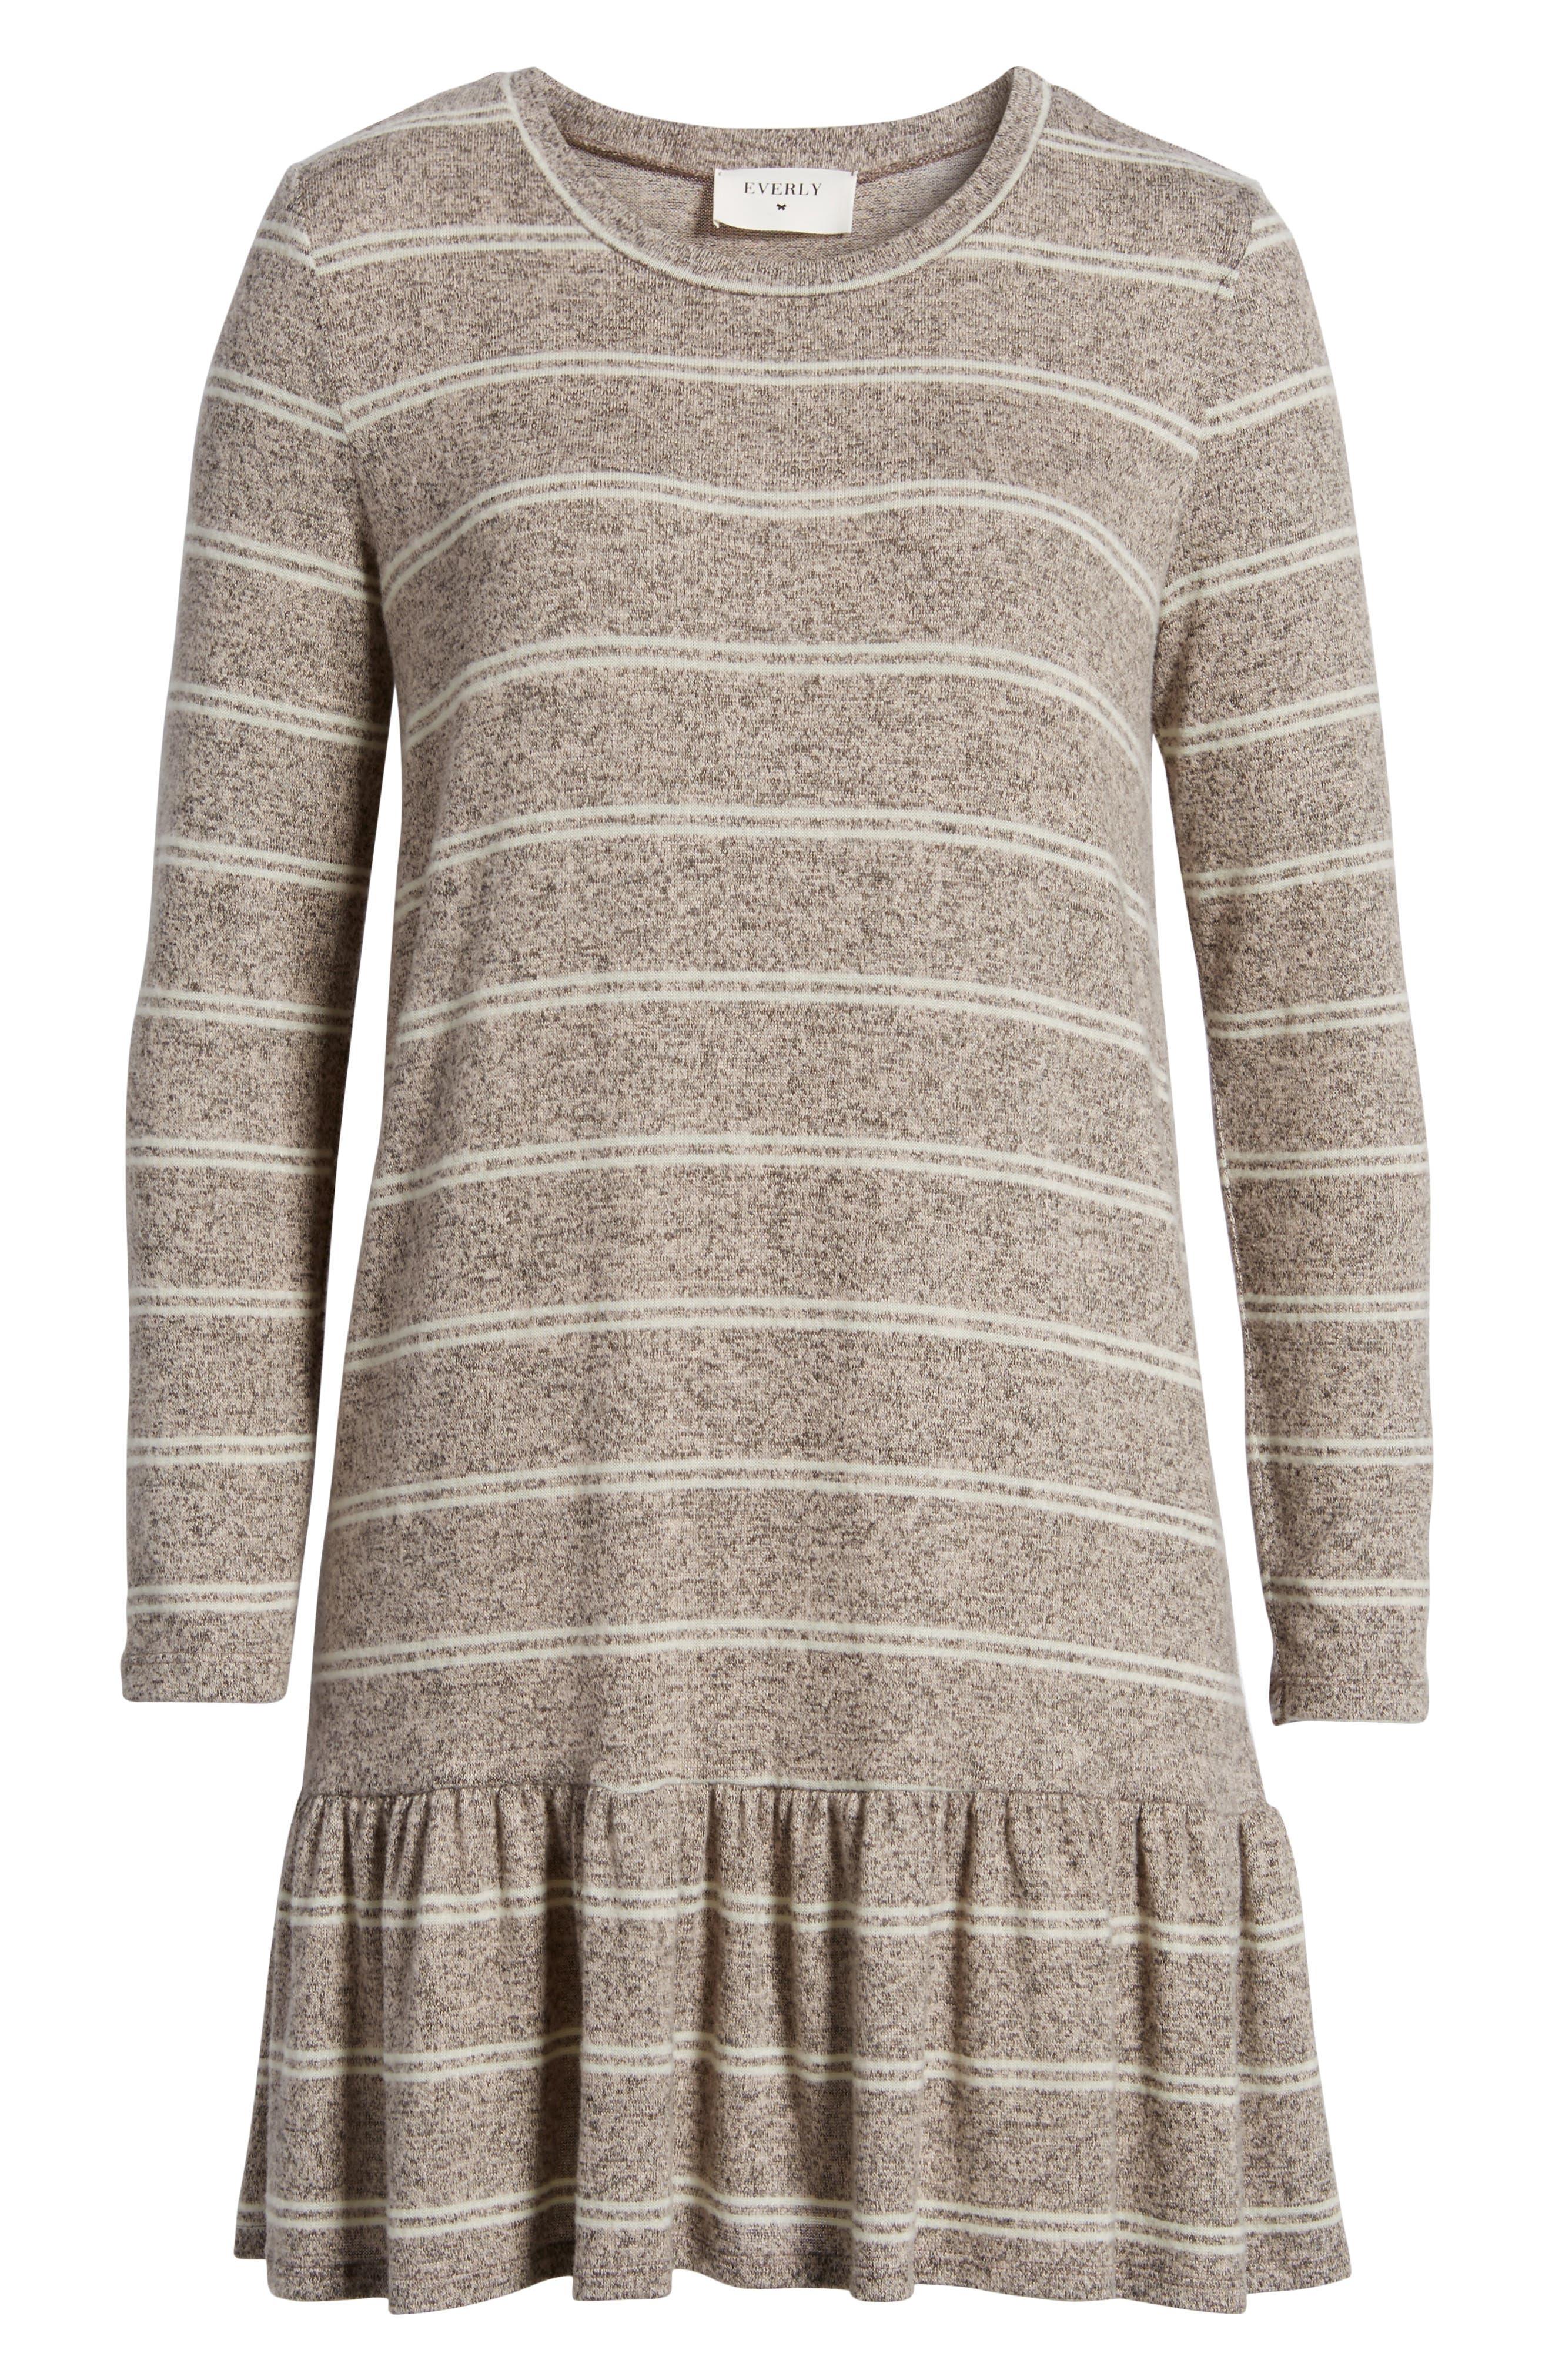 Drop Waist Sweater Dress,                             Alternate thumbnail 6, color,                             Grey/ Ivory